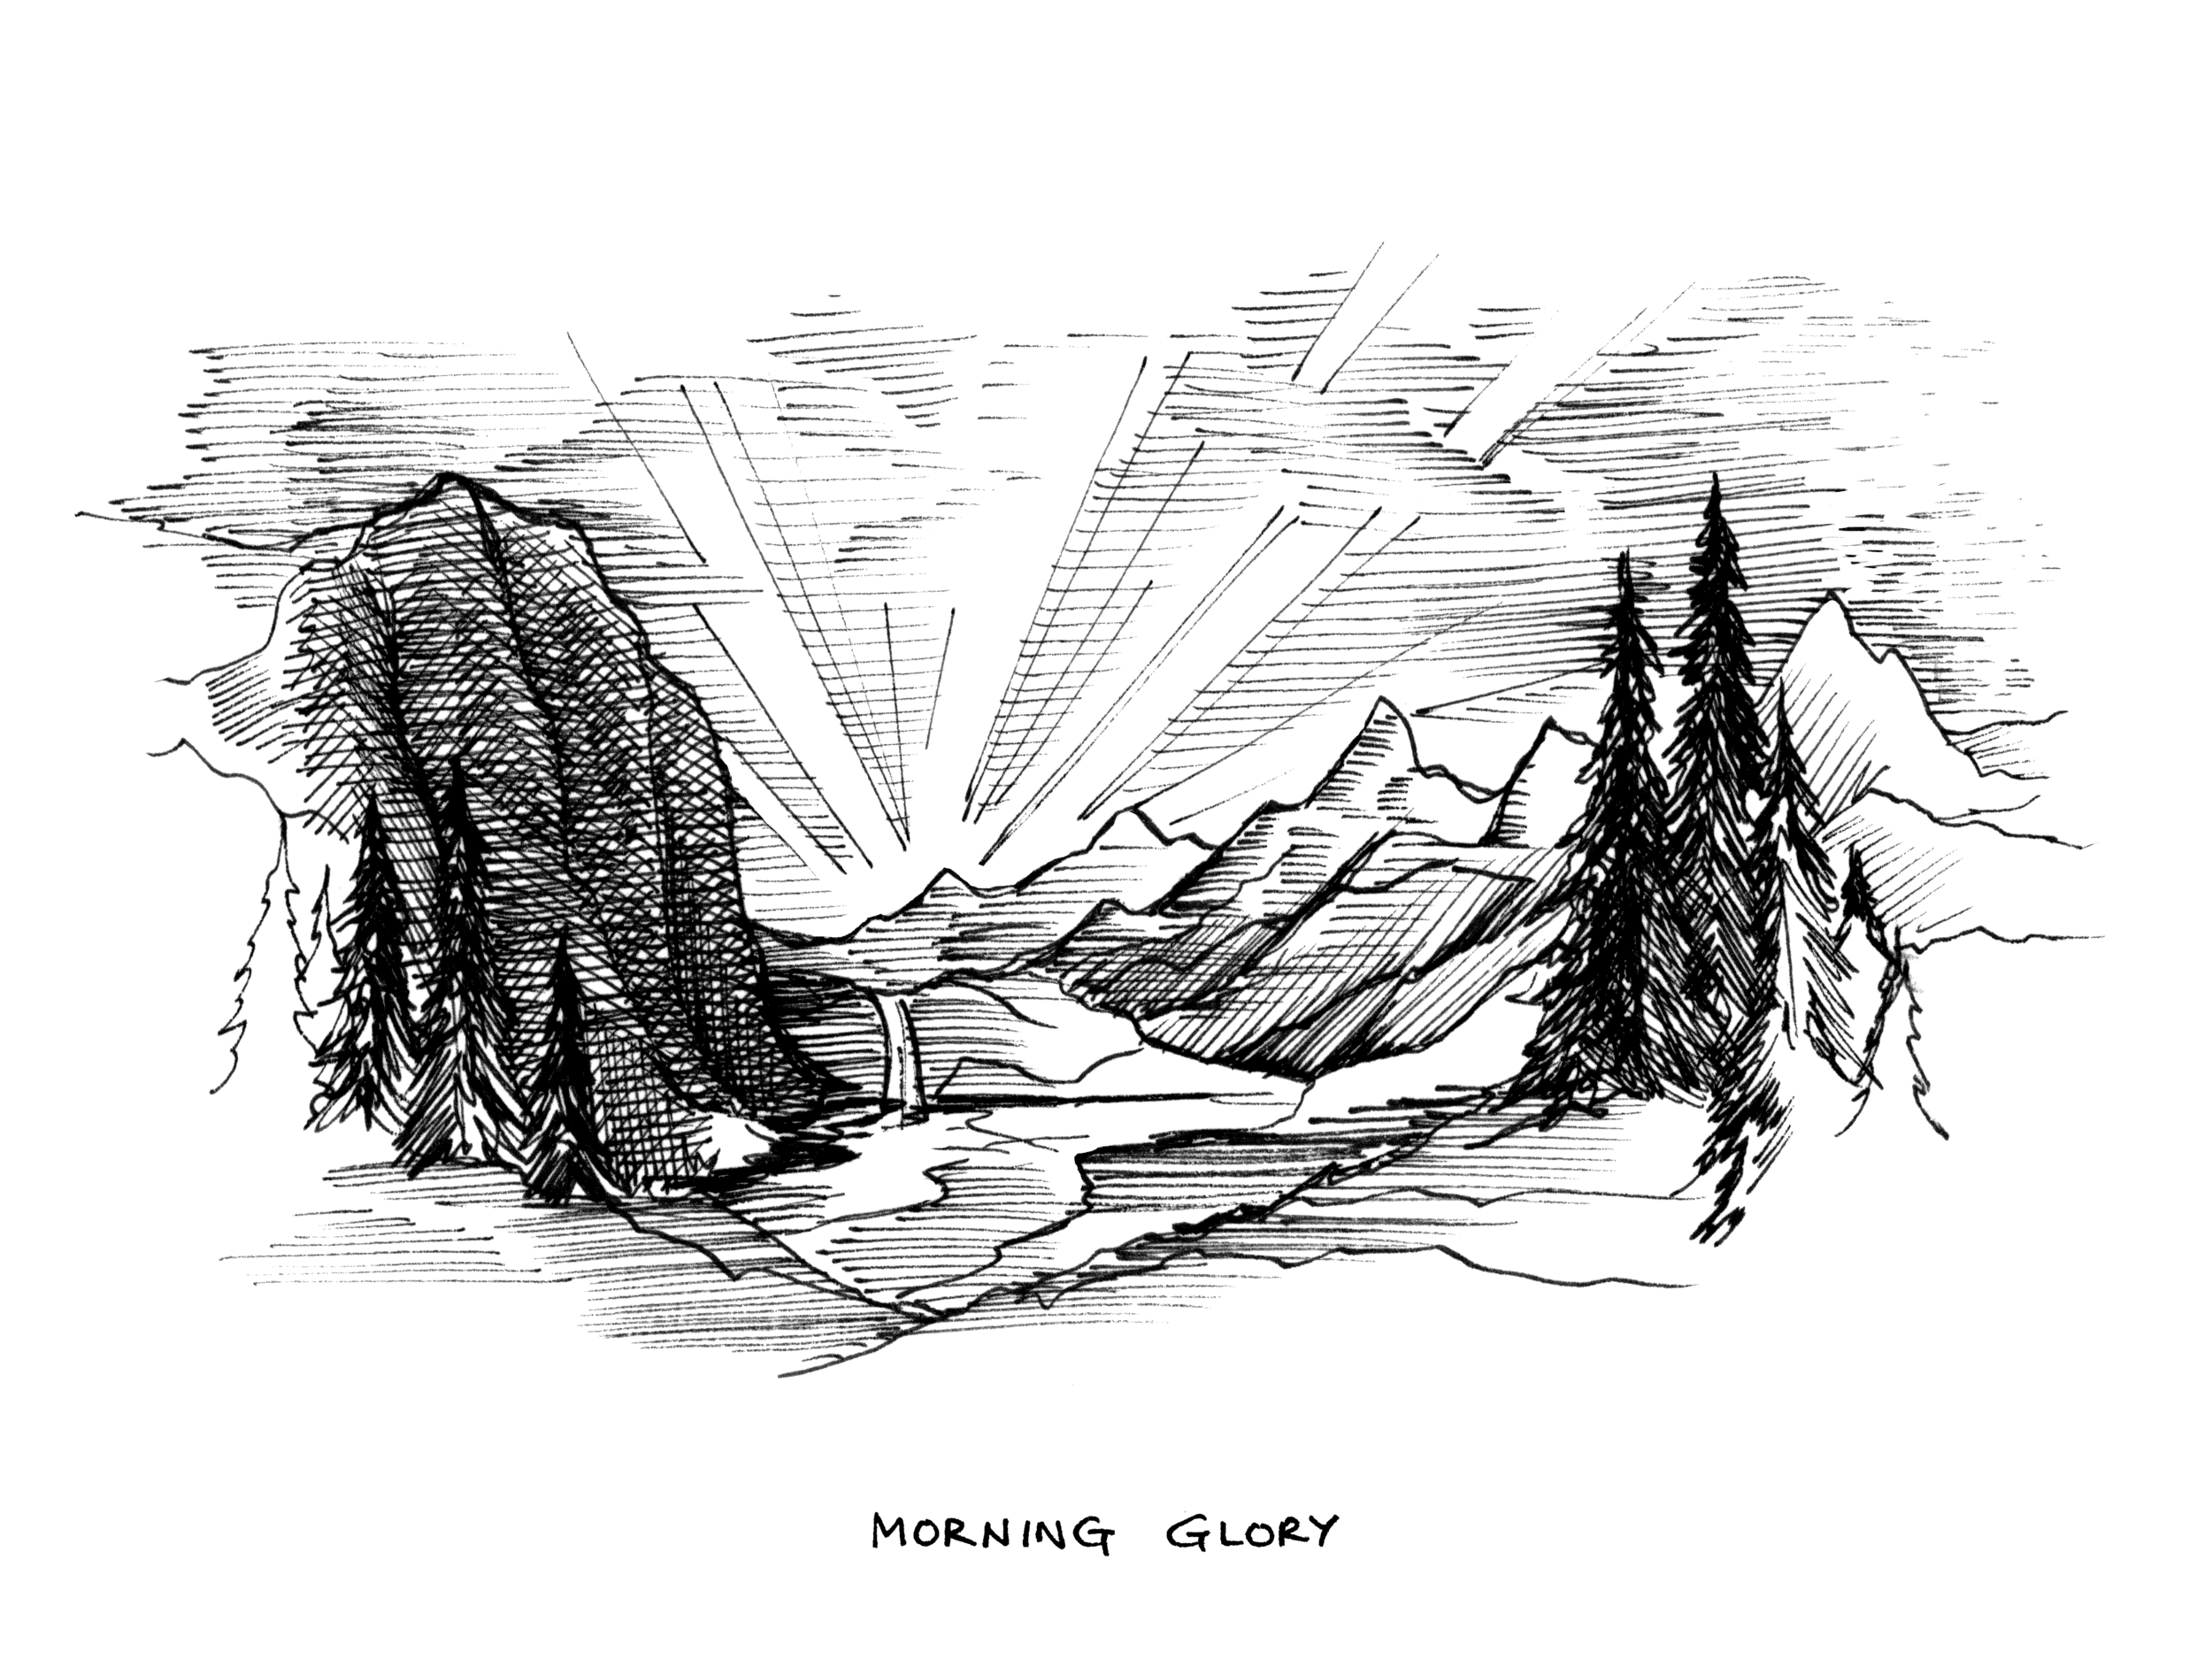 MorningGlory_StrainArt.png